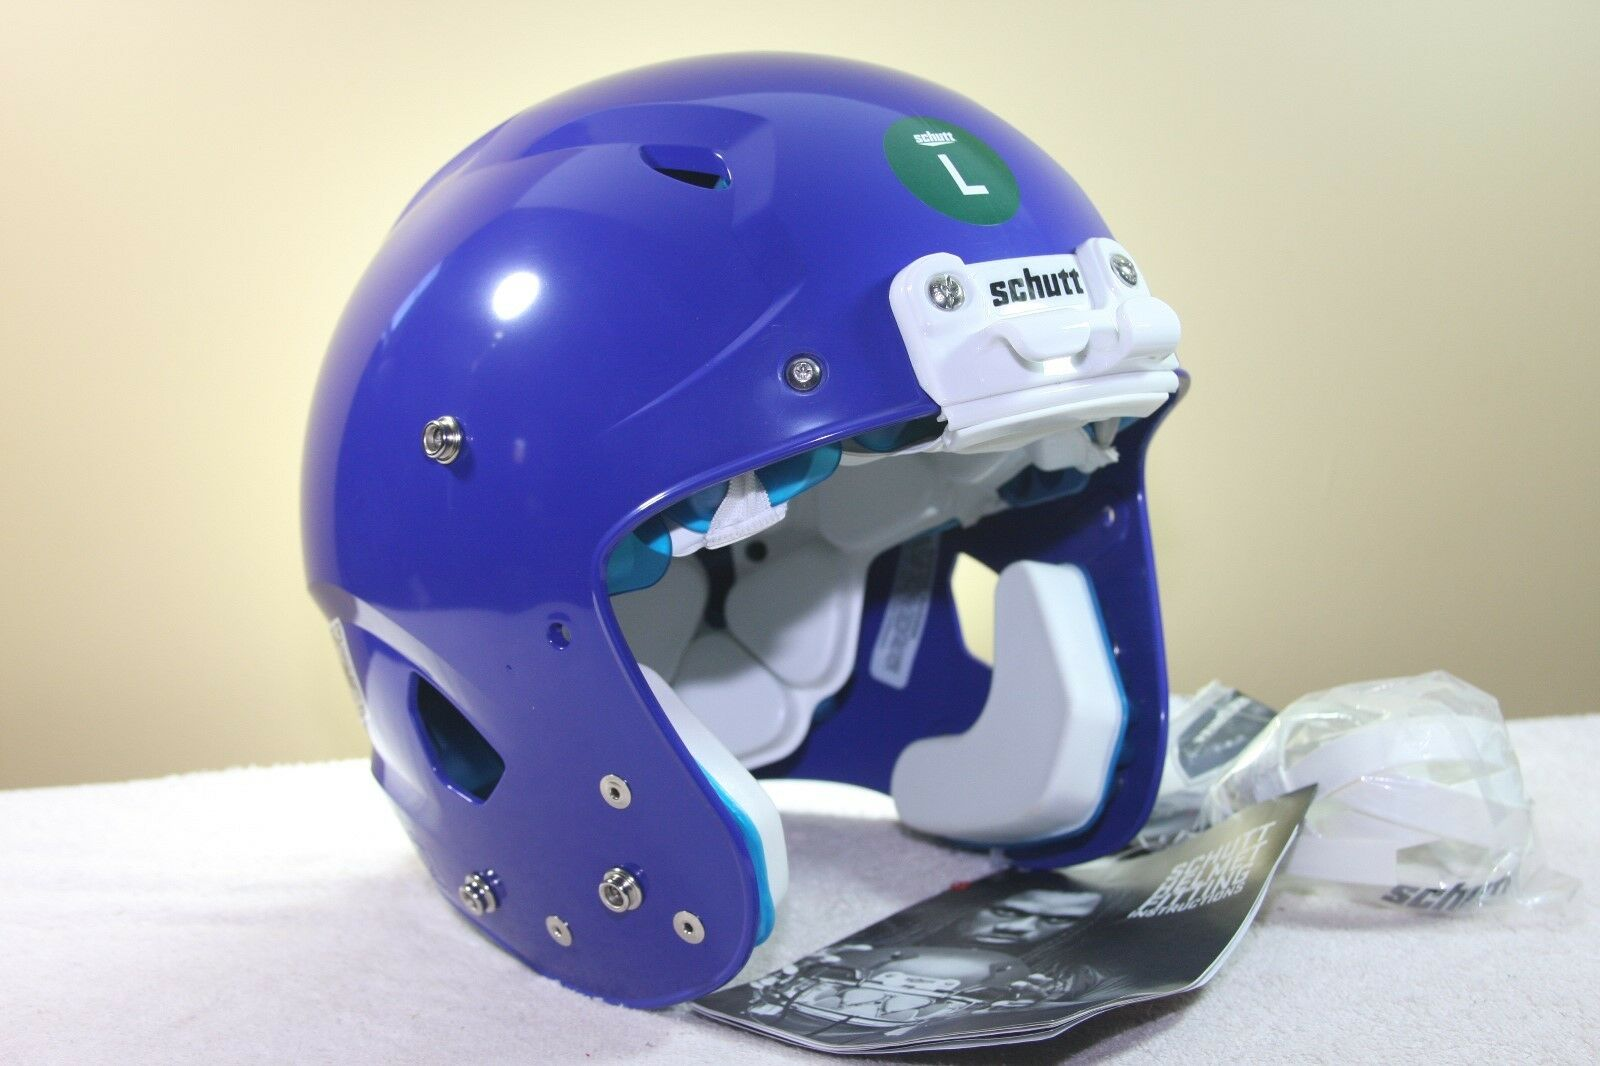 Schutt YOUTH Football Helmet VENGEANCE ROYAL blueE New not used LARGE 2017 134